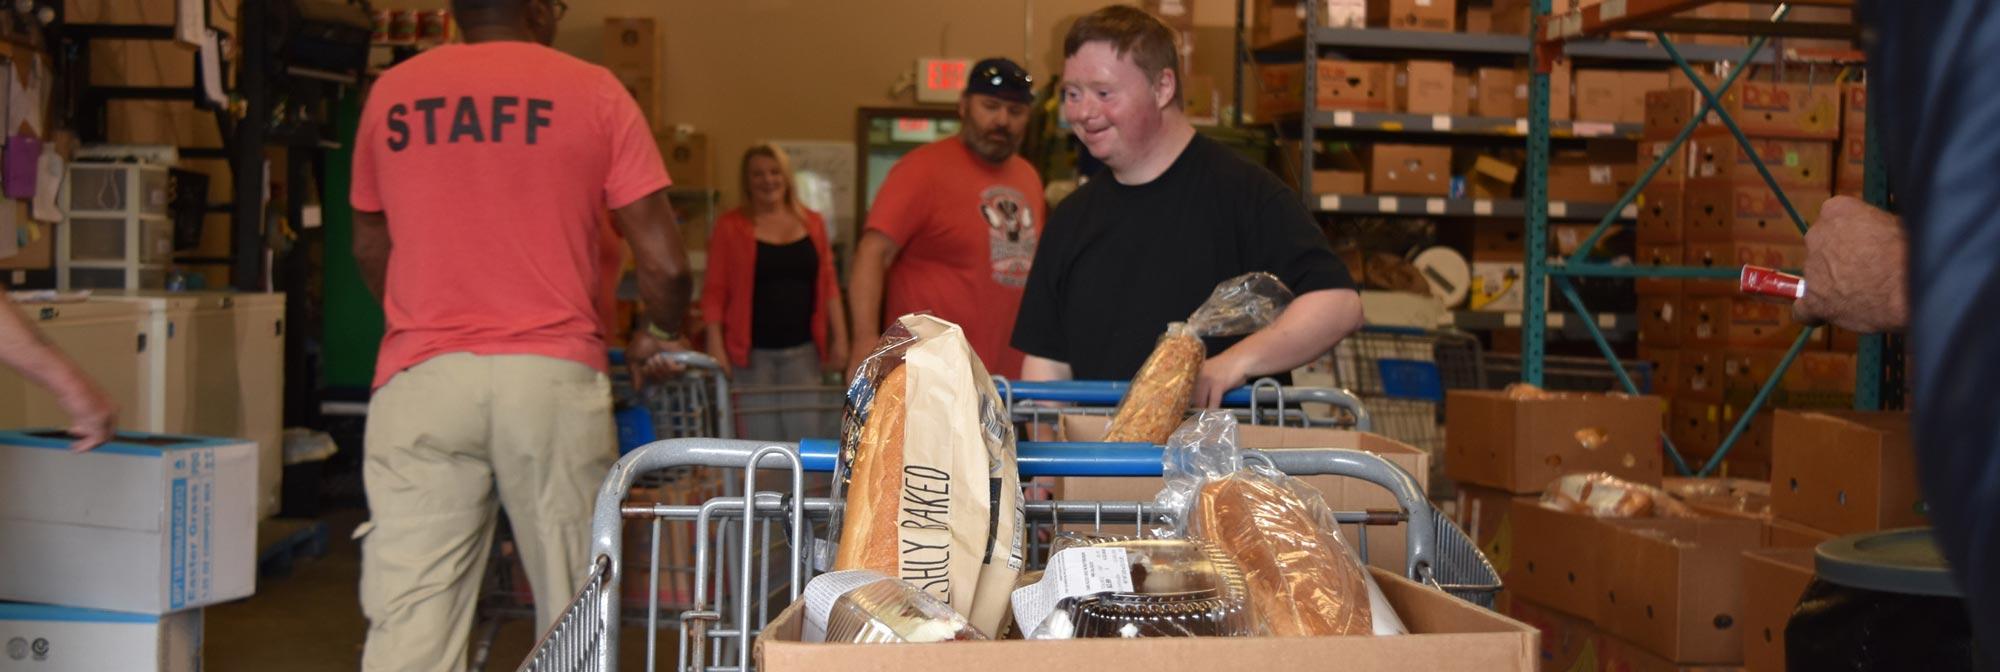 Food Distribution - Food Boxes - Manna Café Ministries